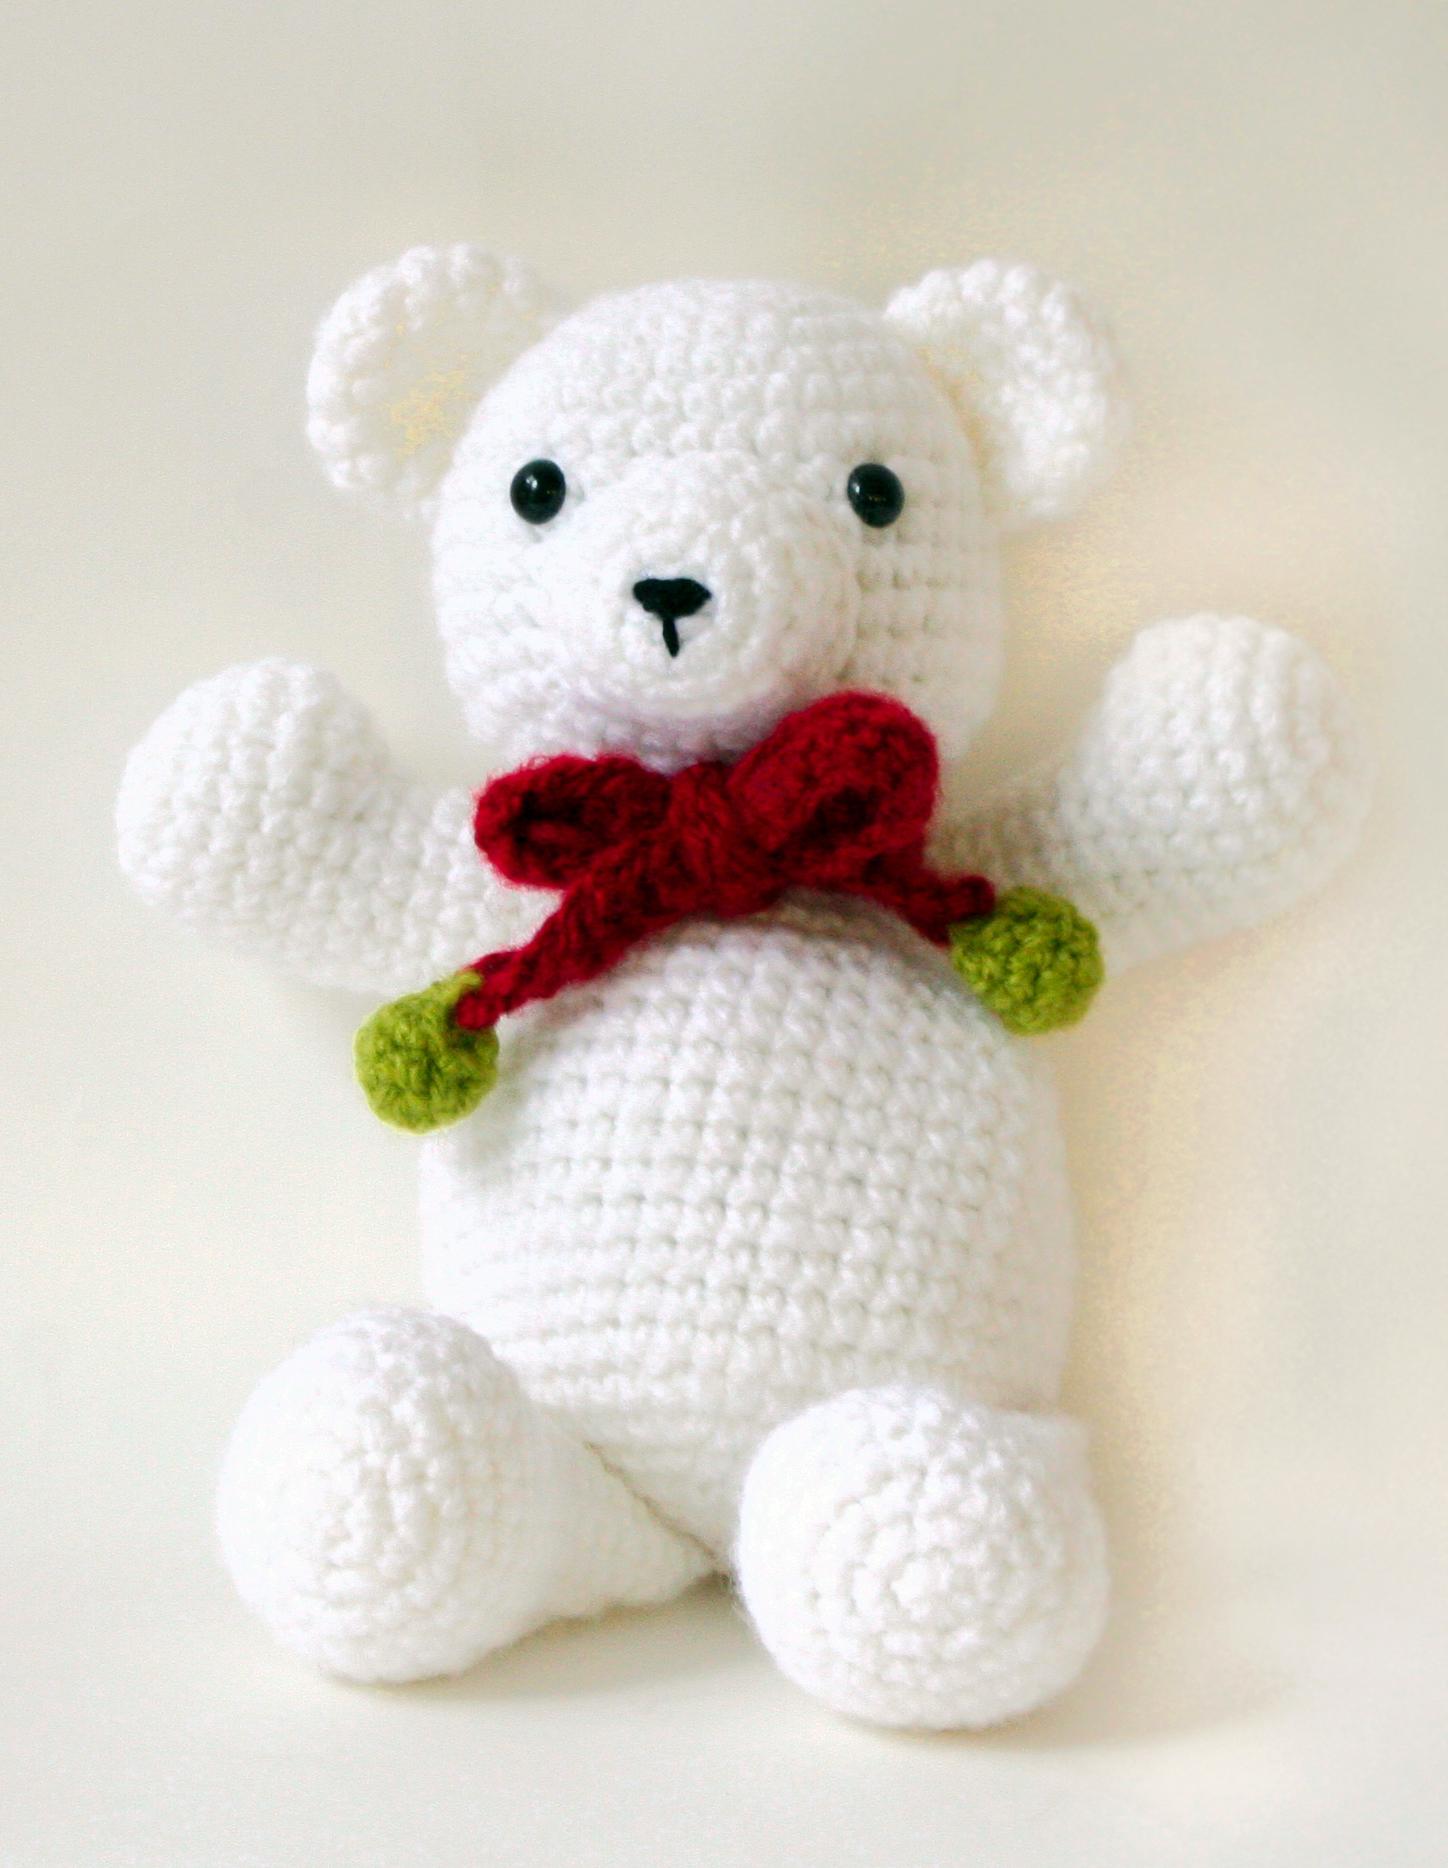 Free Teddy Bear crochet pattern - Amigurumi Today | 1868x1448